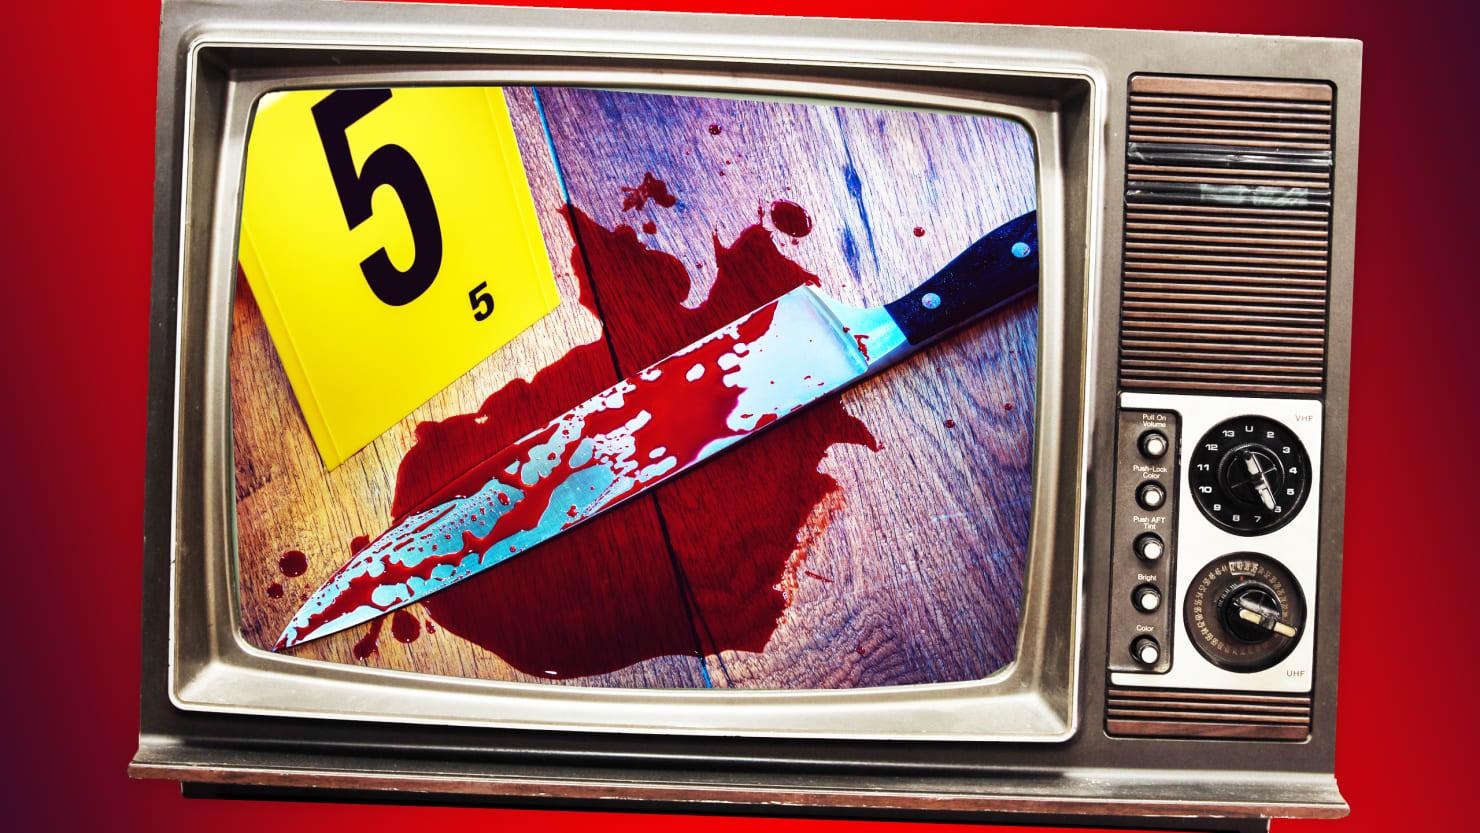 Confessions of a True-Crime Re-Enactor: Inside TV's Hottest, Most Morbid Genre